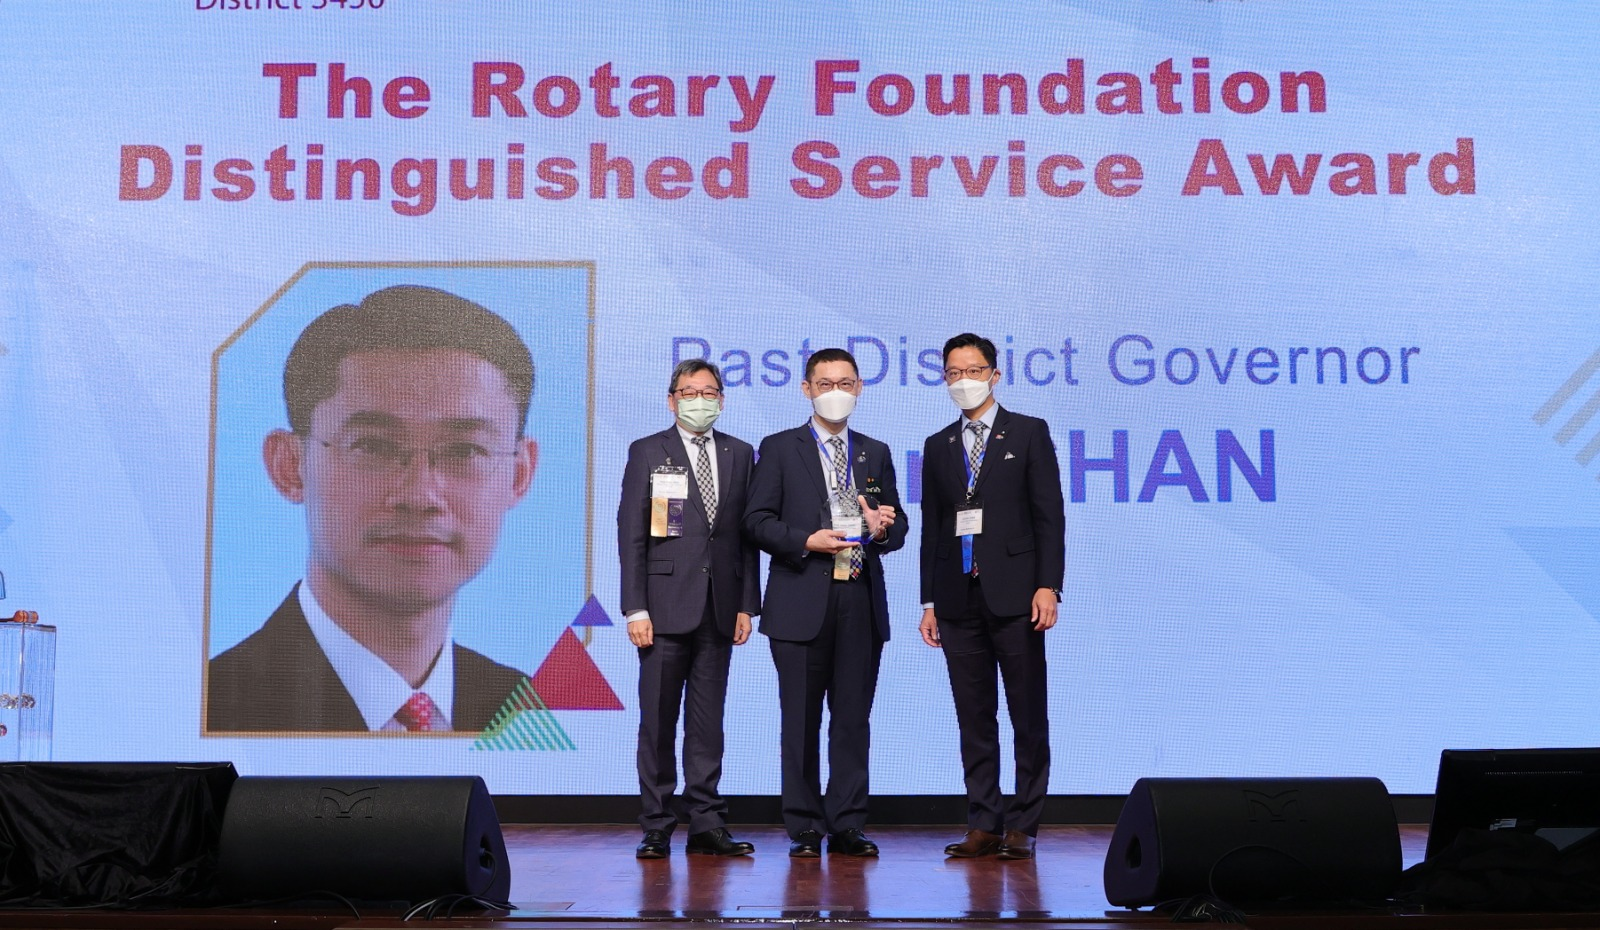 Rotary Foundation Distinguished Service Award